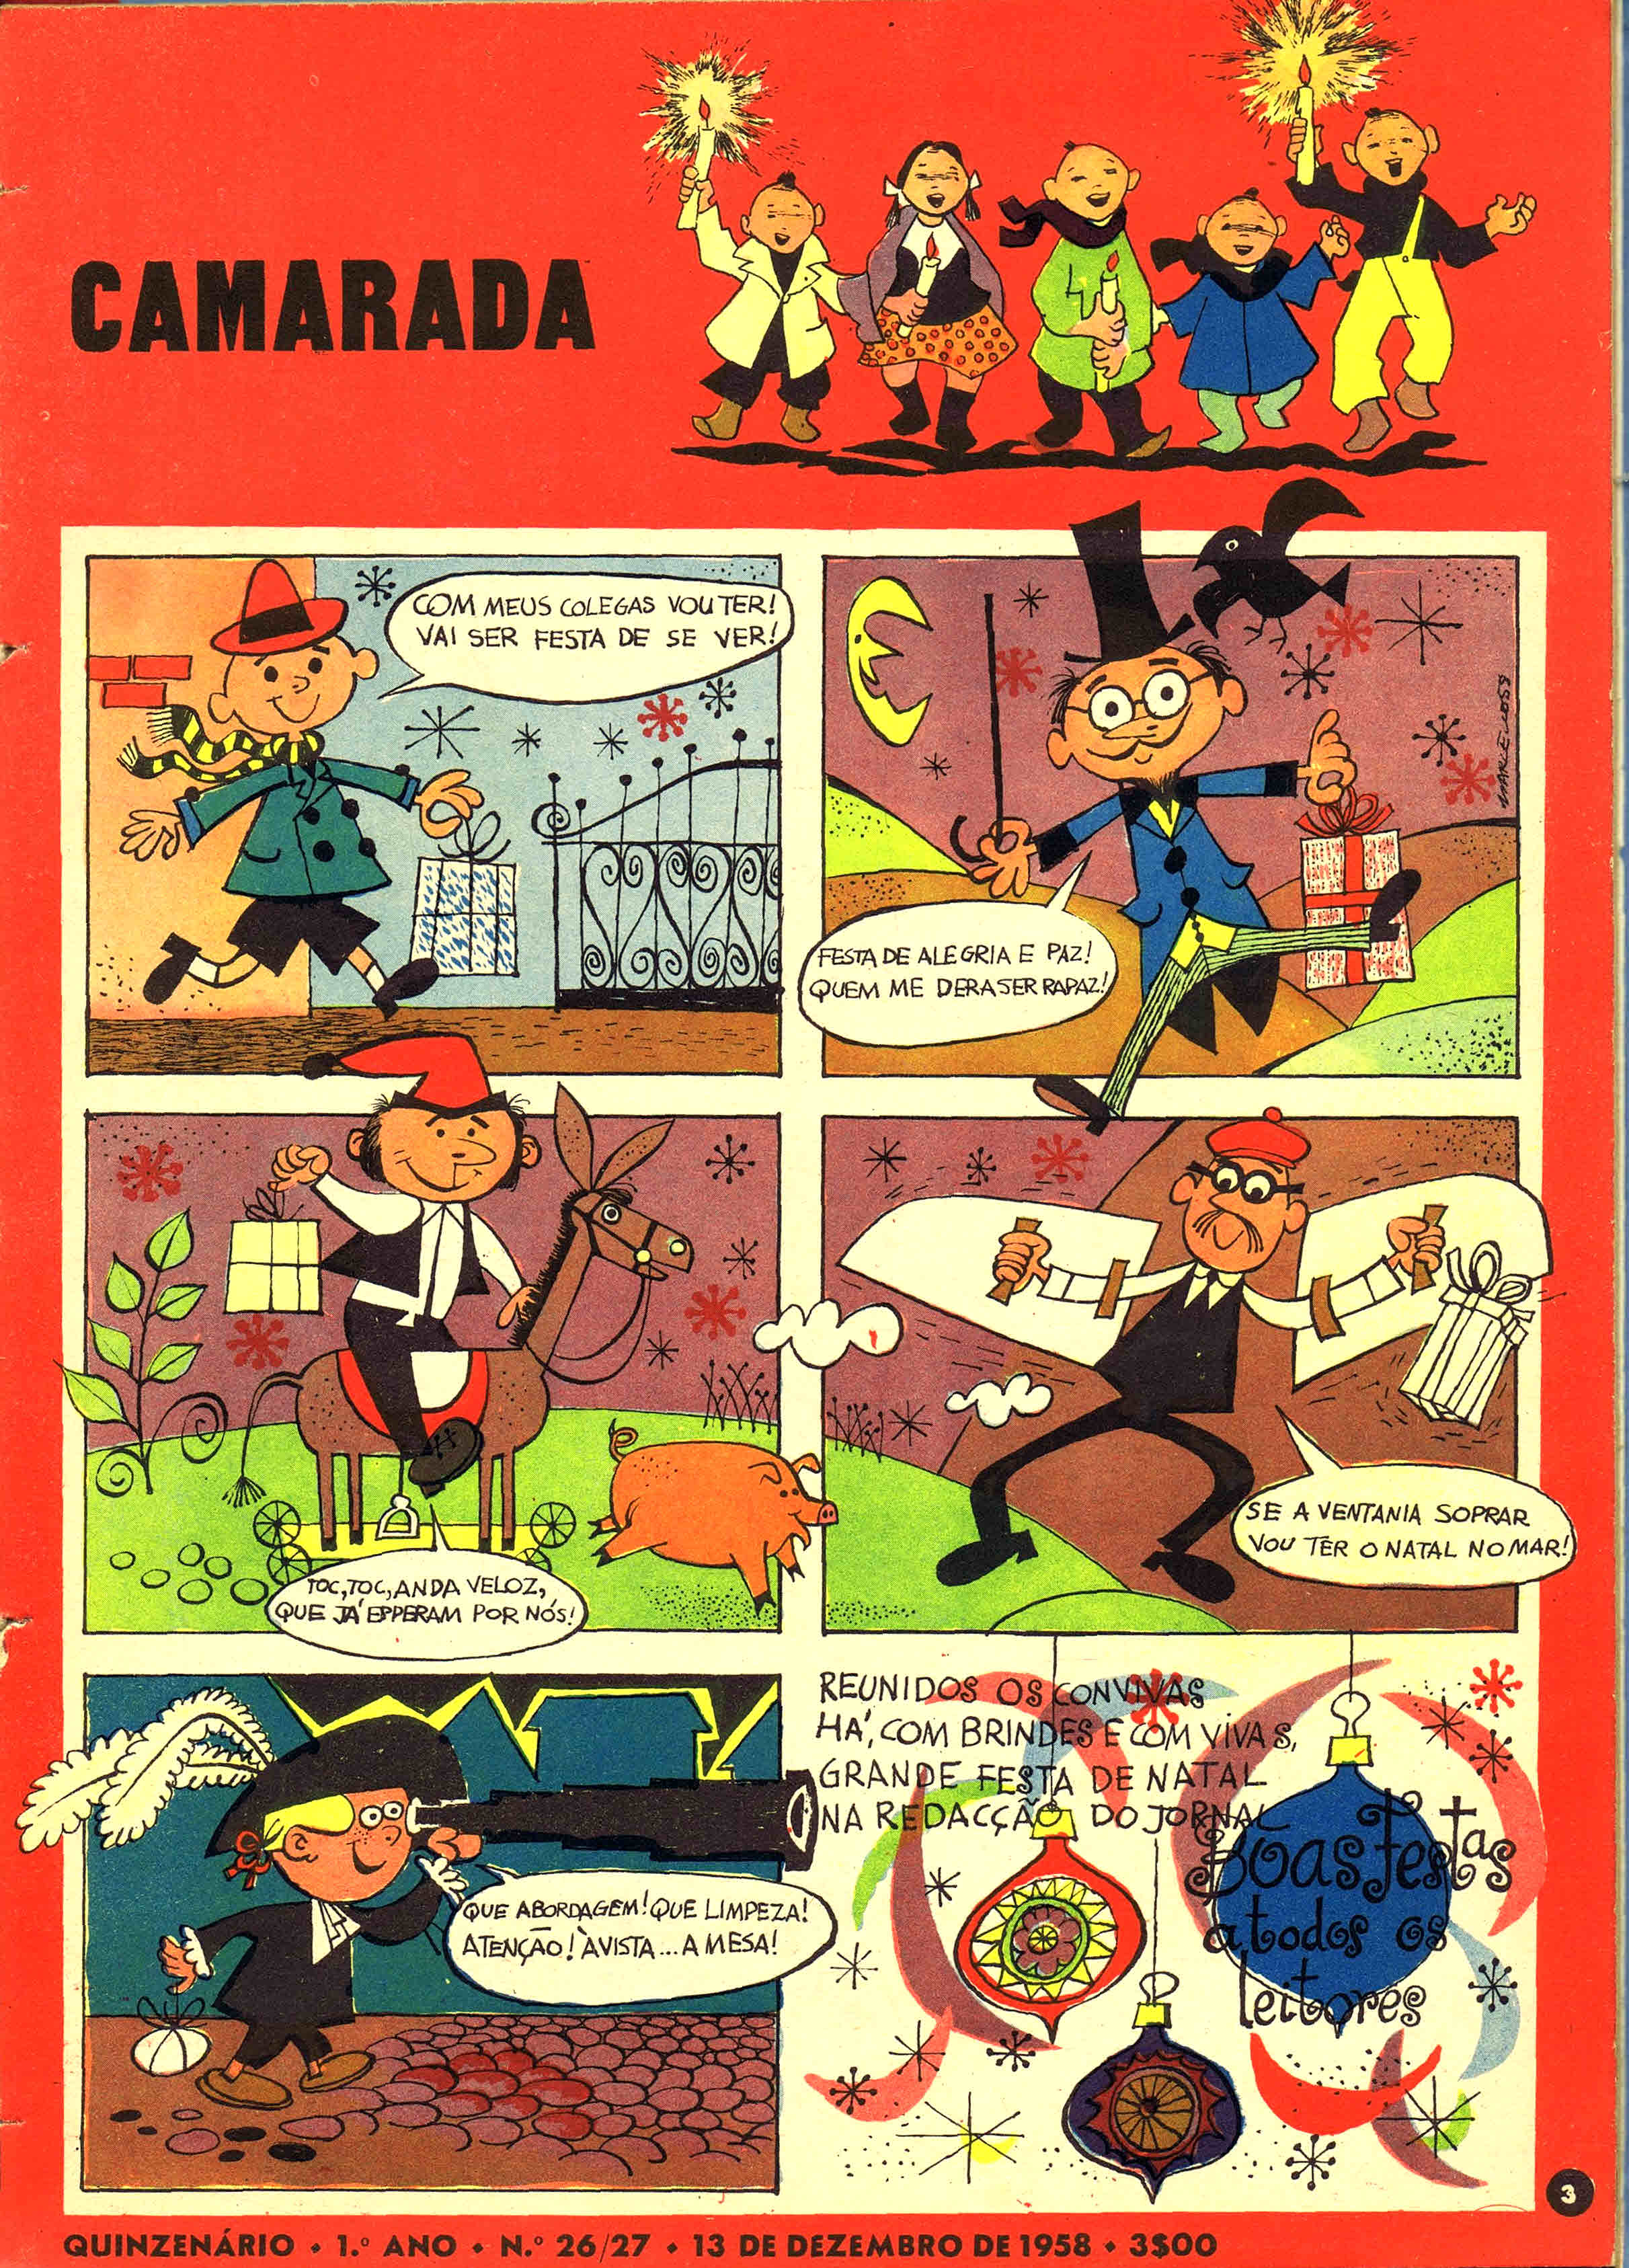 camarada mocidade portuguesa nº 26-27 1958